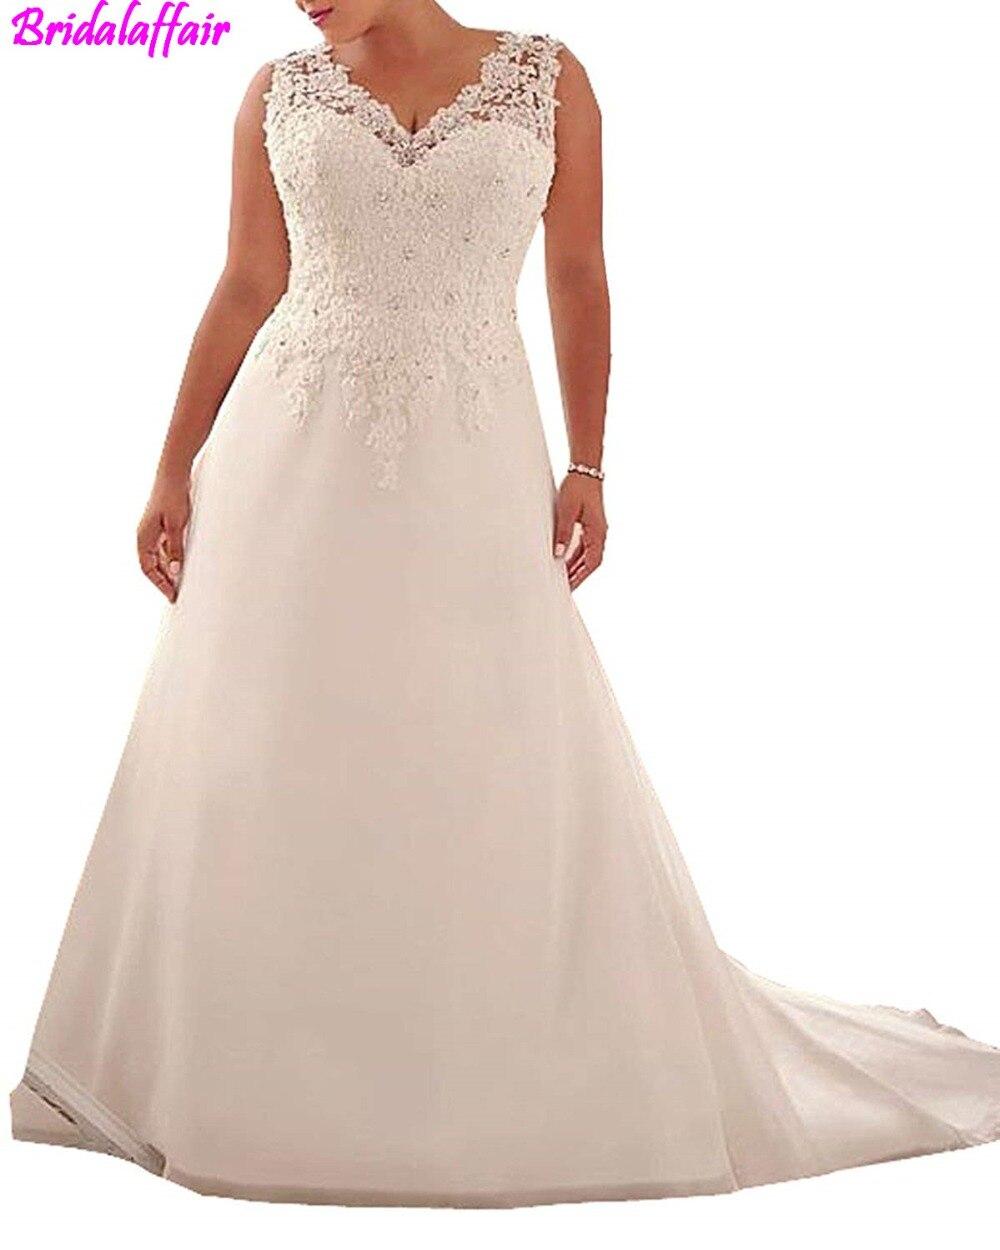 2018 a line Wedding Dress Applique with Beading Long Bridal Dress for Women s bridal dress